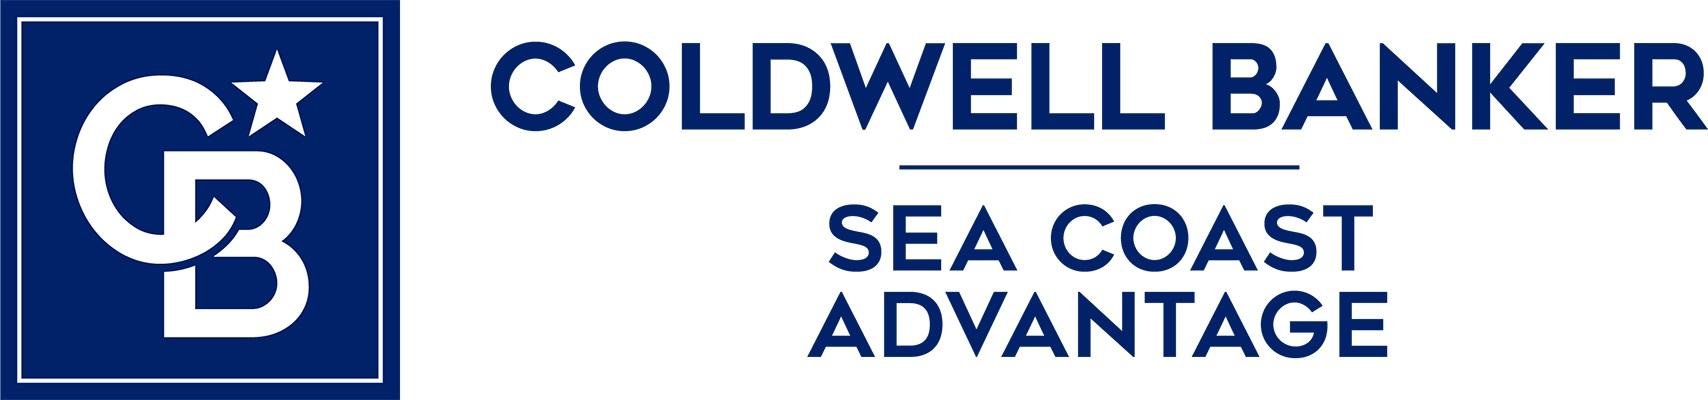 Terri Lawrence - Coldwell Banker Sea Coast Advantage Realty Logo